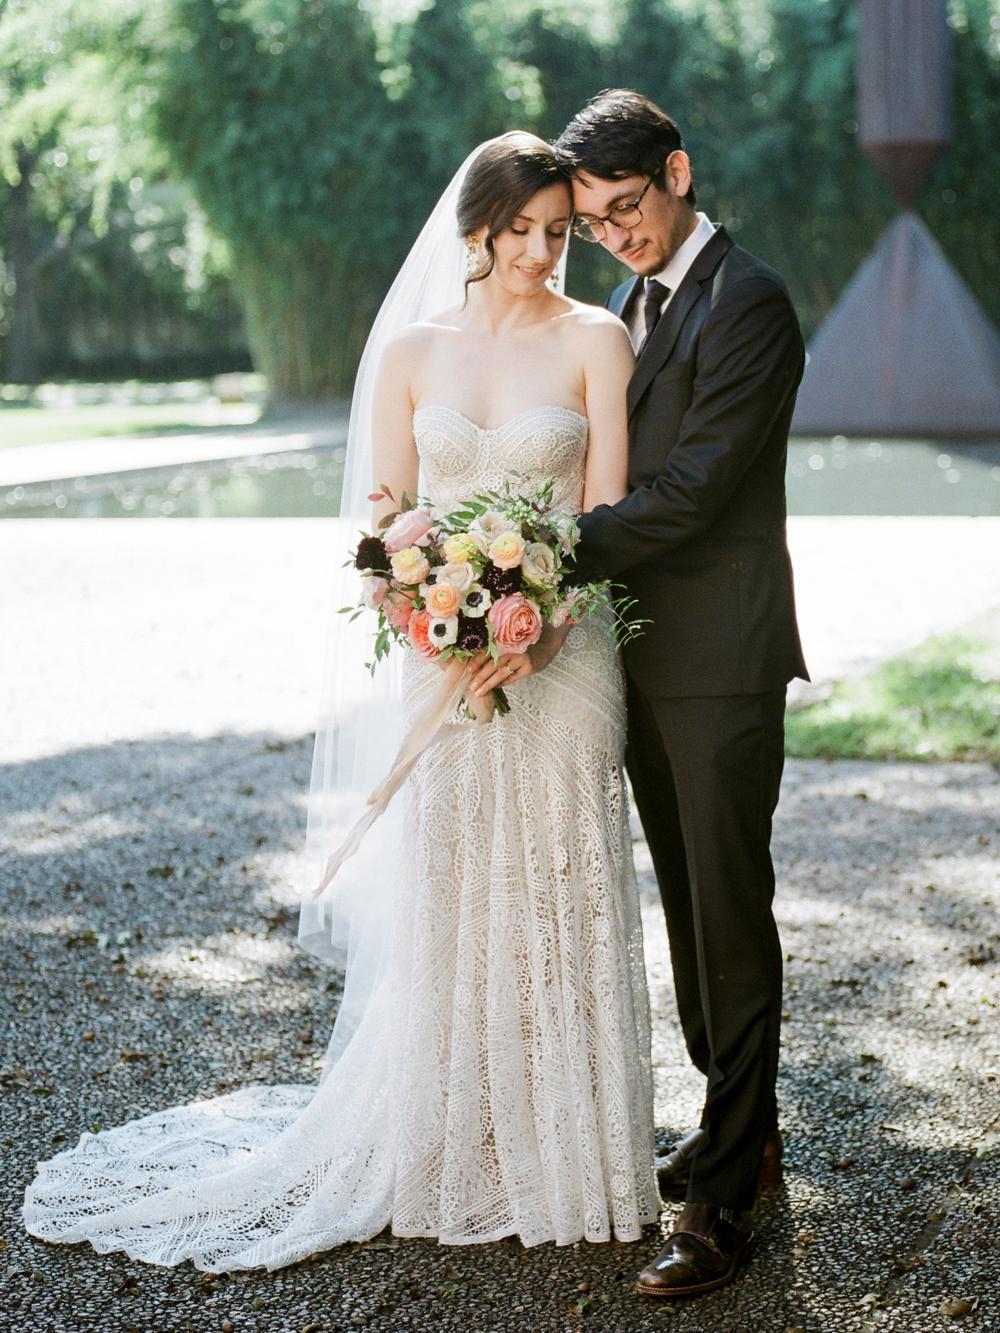 fall wedding at rothko chapel- houston wedding photographer-christine gosch - film photographer - elopement photographer- intimate wedding - lovely bride wedding gown-17.jpg